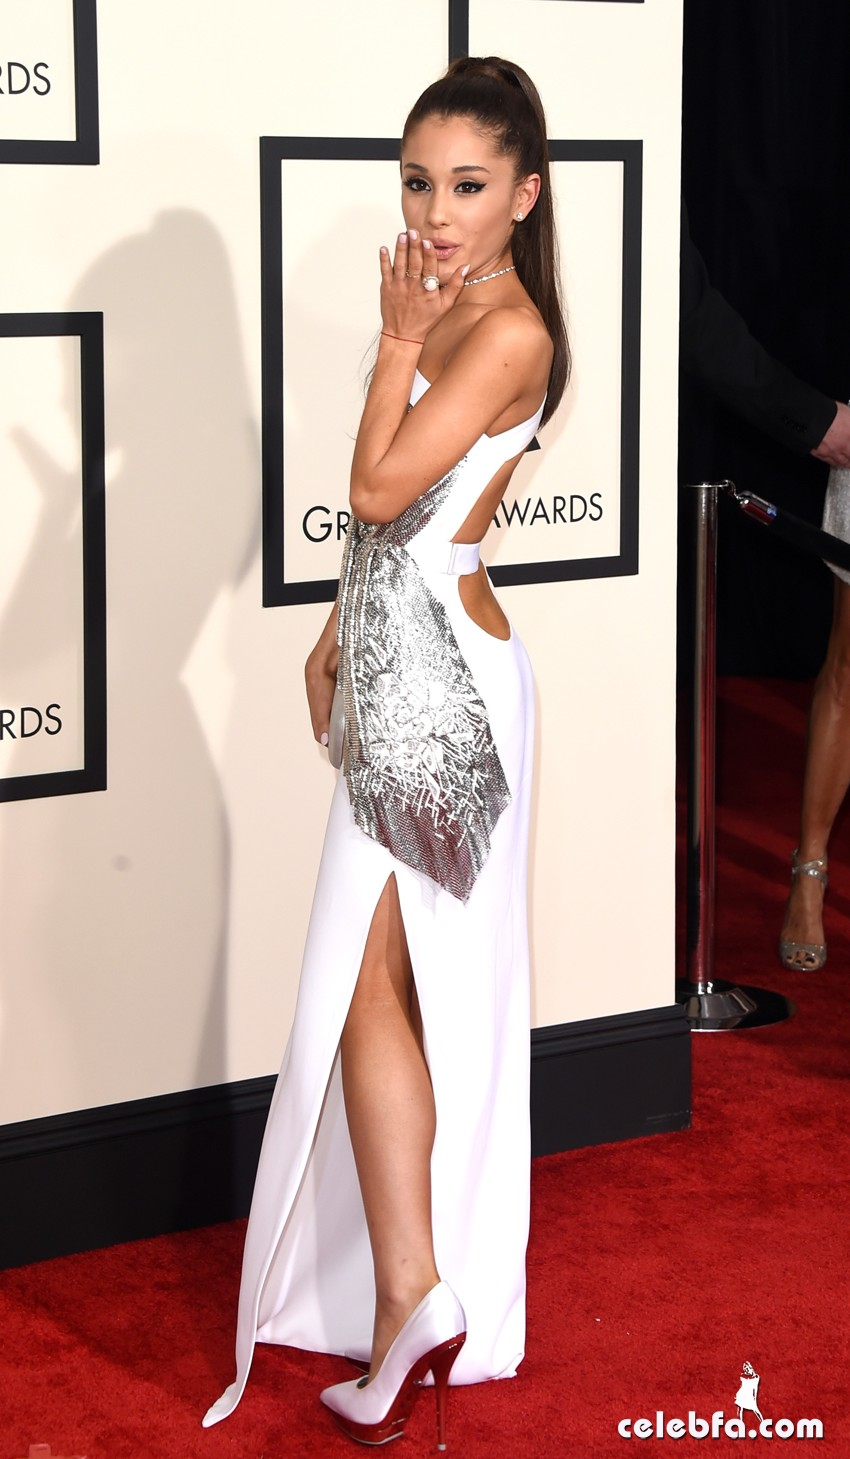 Grande_Ariana_2015_GrammyAwards_CelebFa (6)